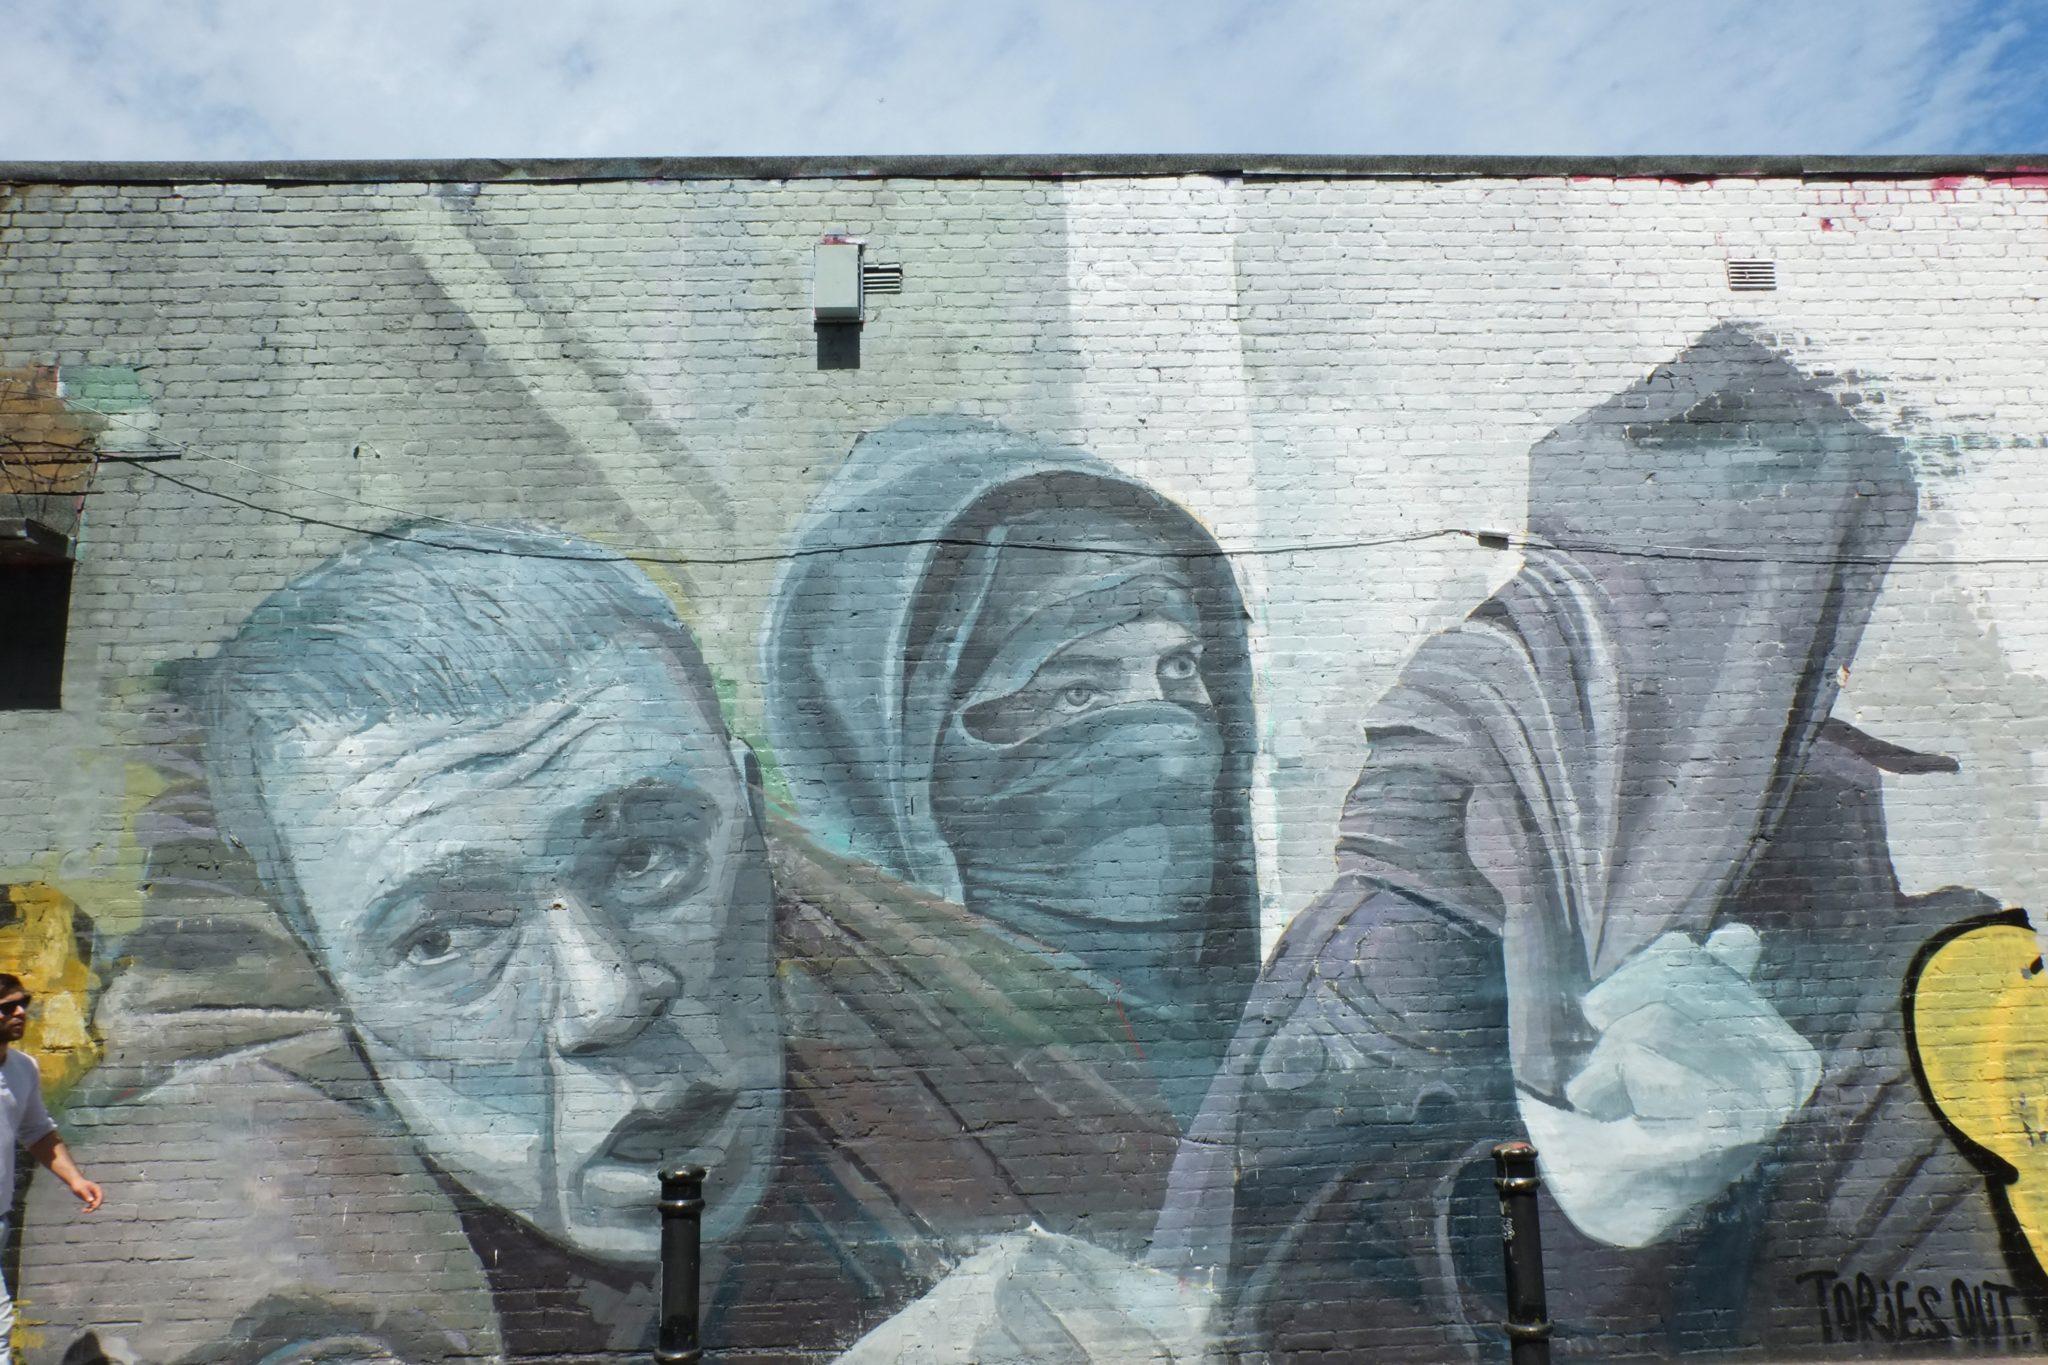 Mural street art in Brick Lane, London